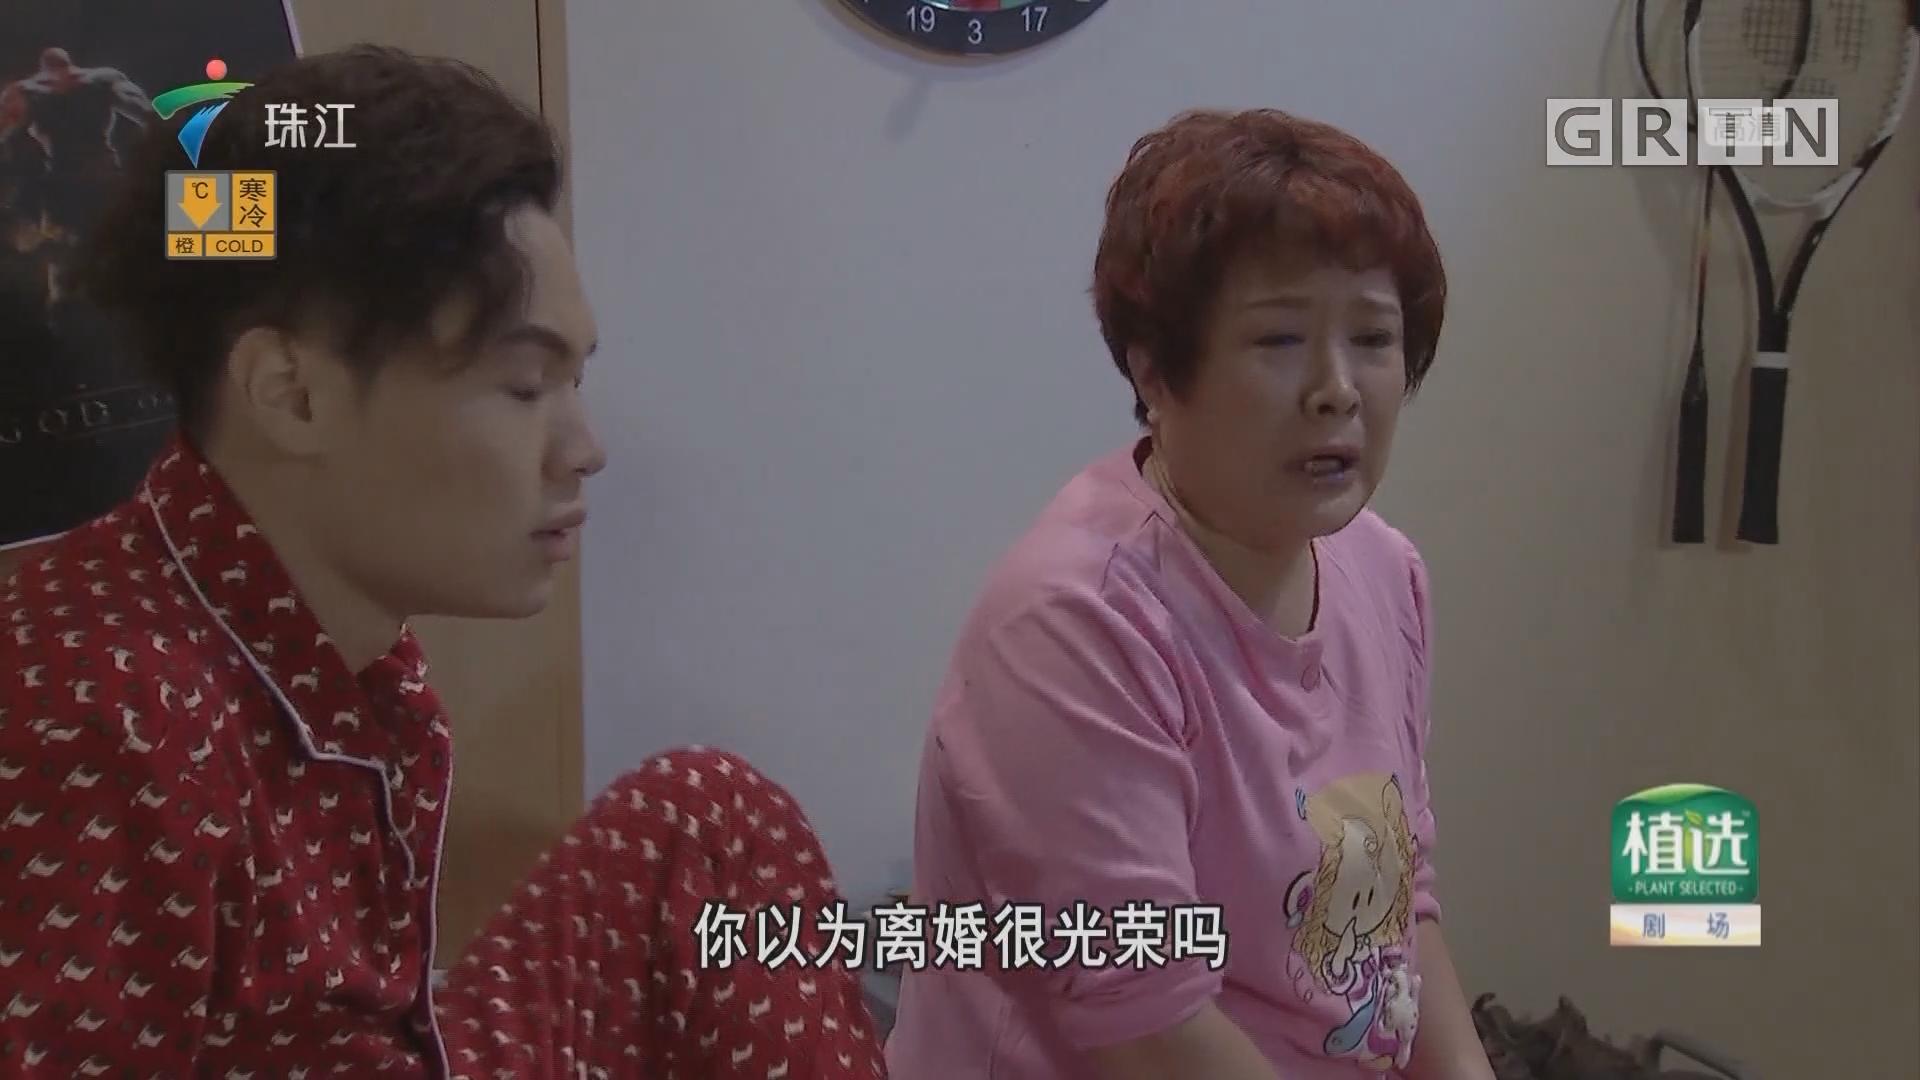 [HD][2018-12-30]外来媳妇本地郎:已婚人士(上)